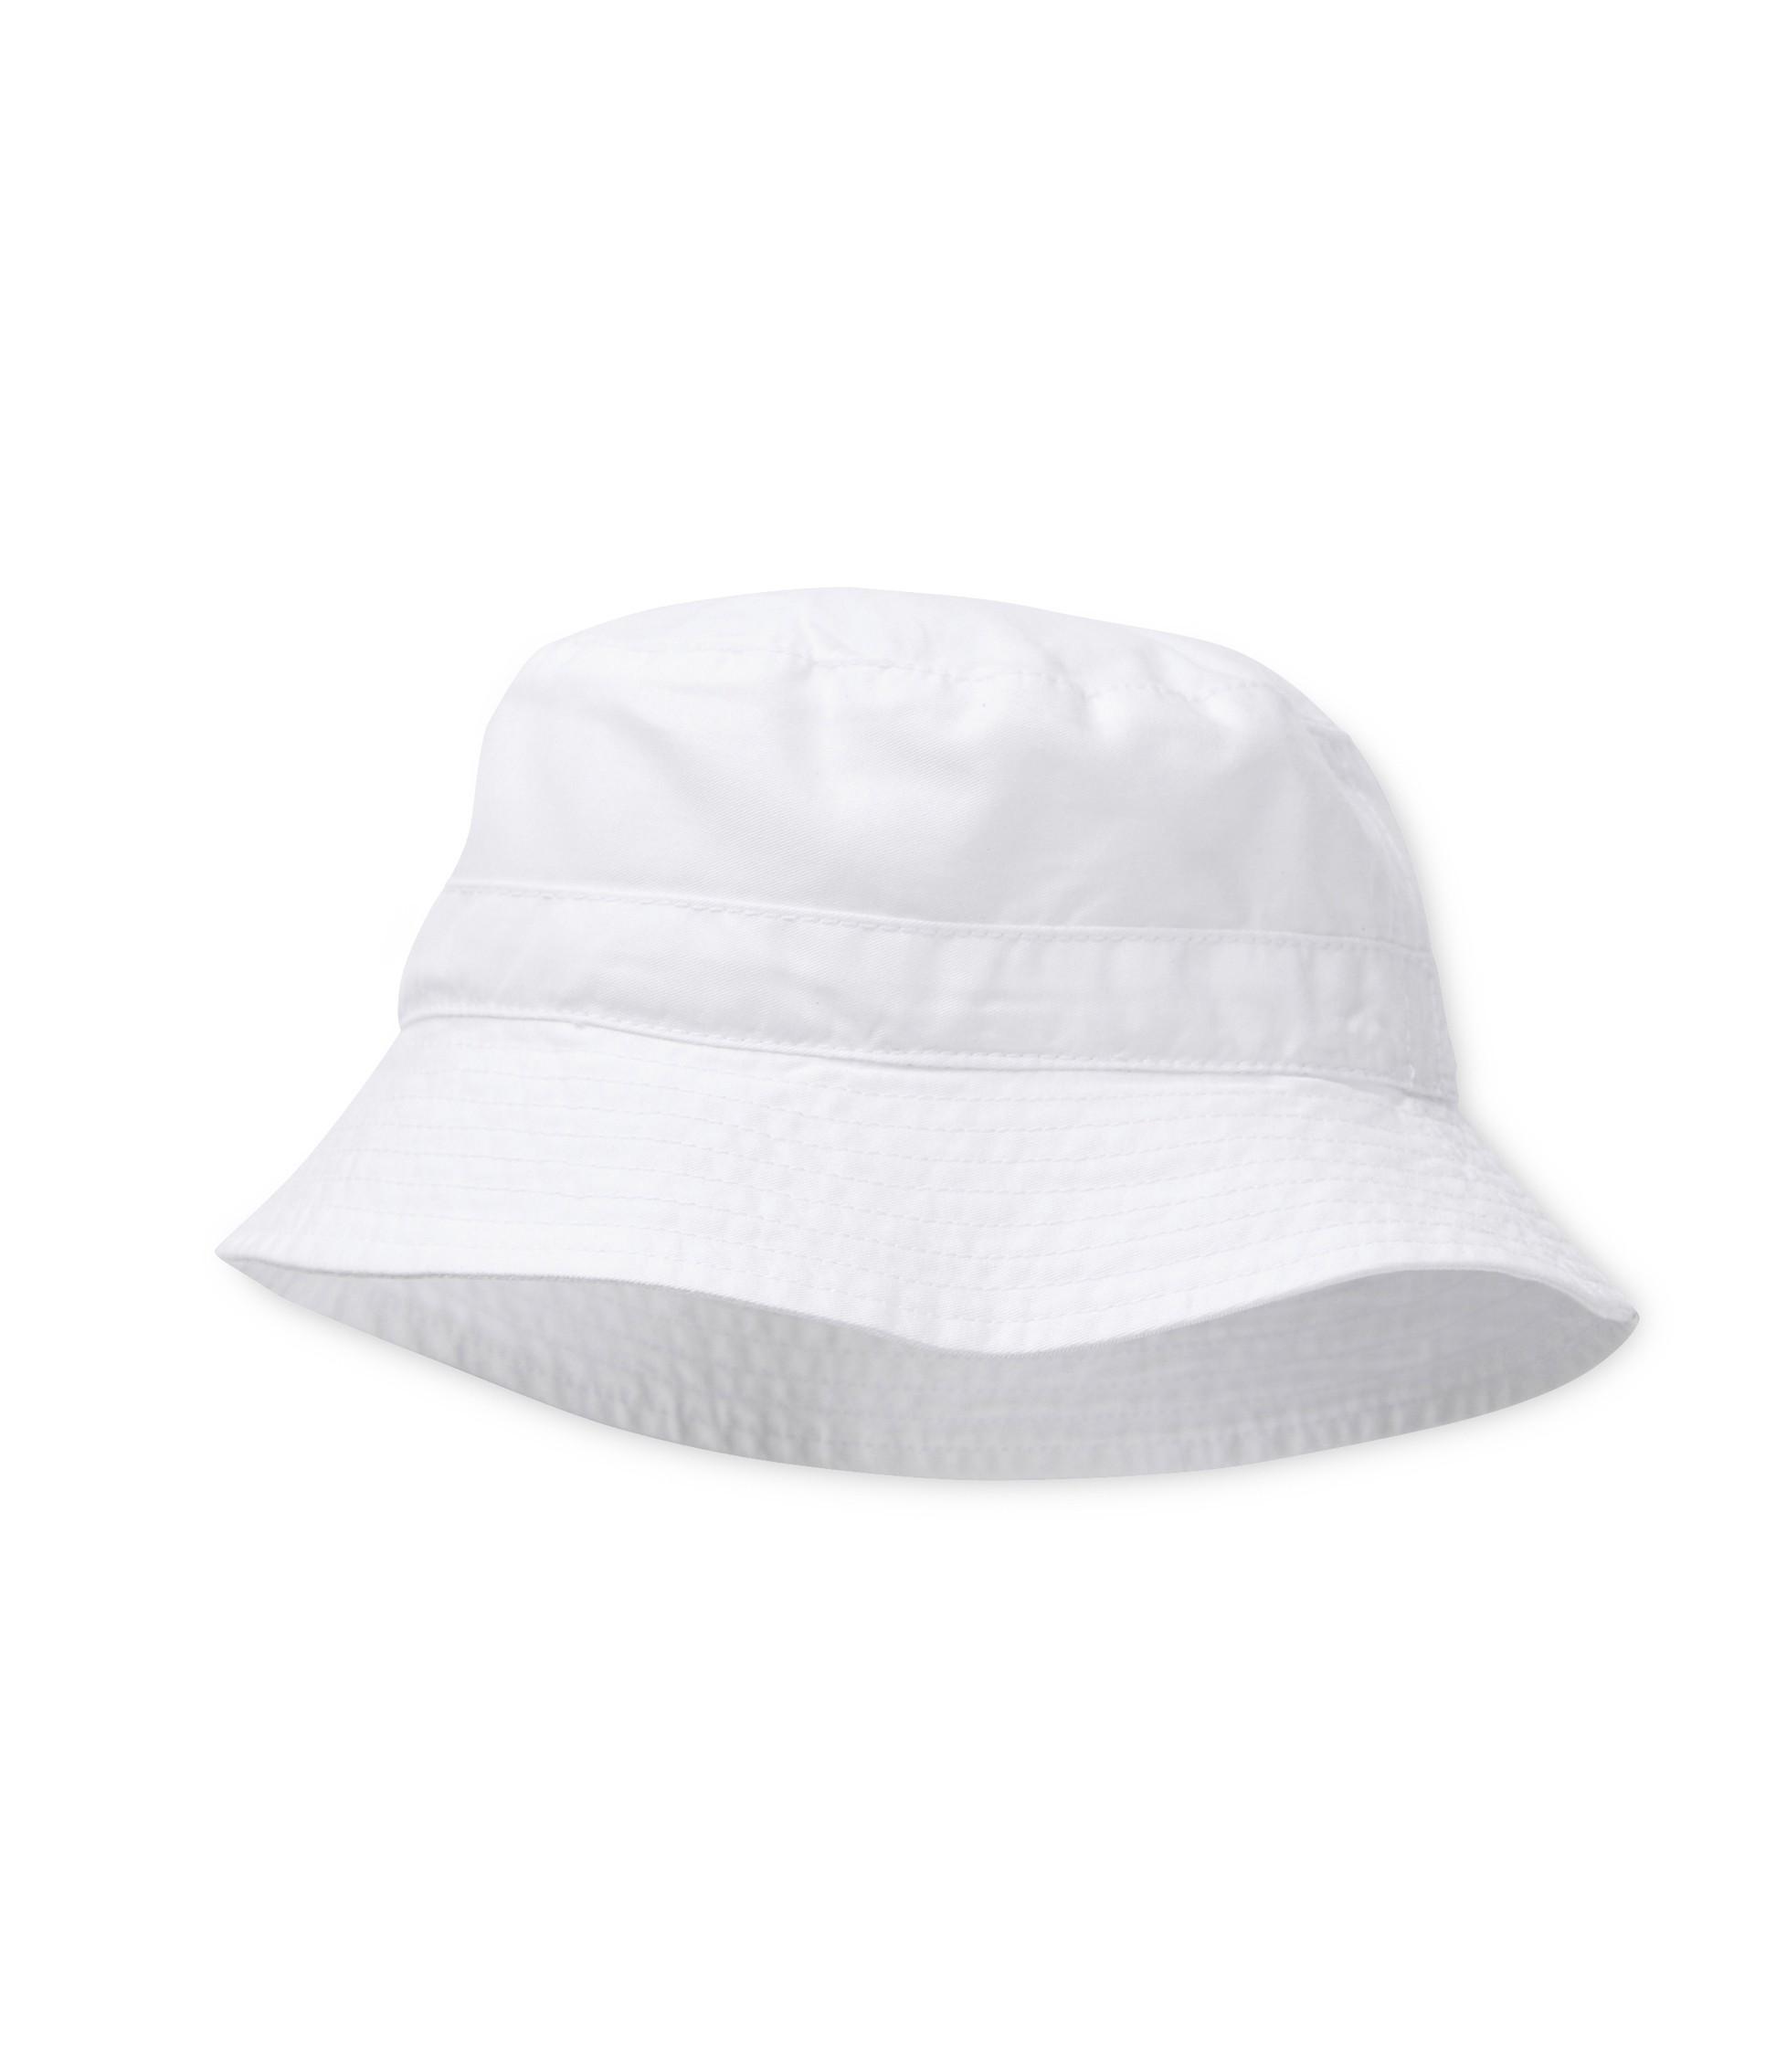 Baby boy bucket hat in plain serge - petit-bateau.gr 5f2b63023c1